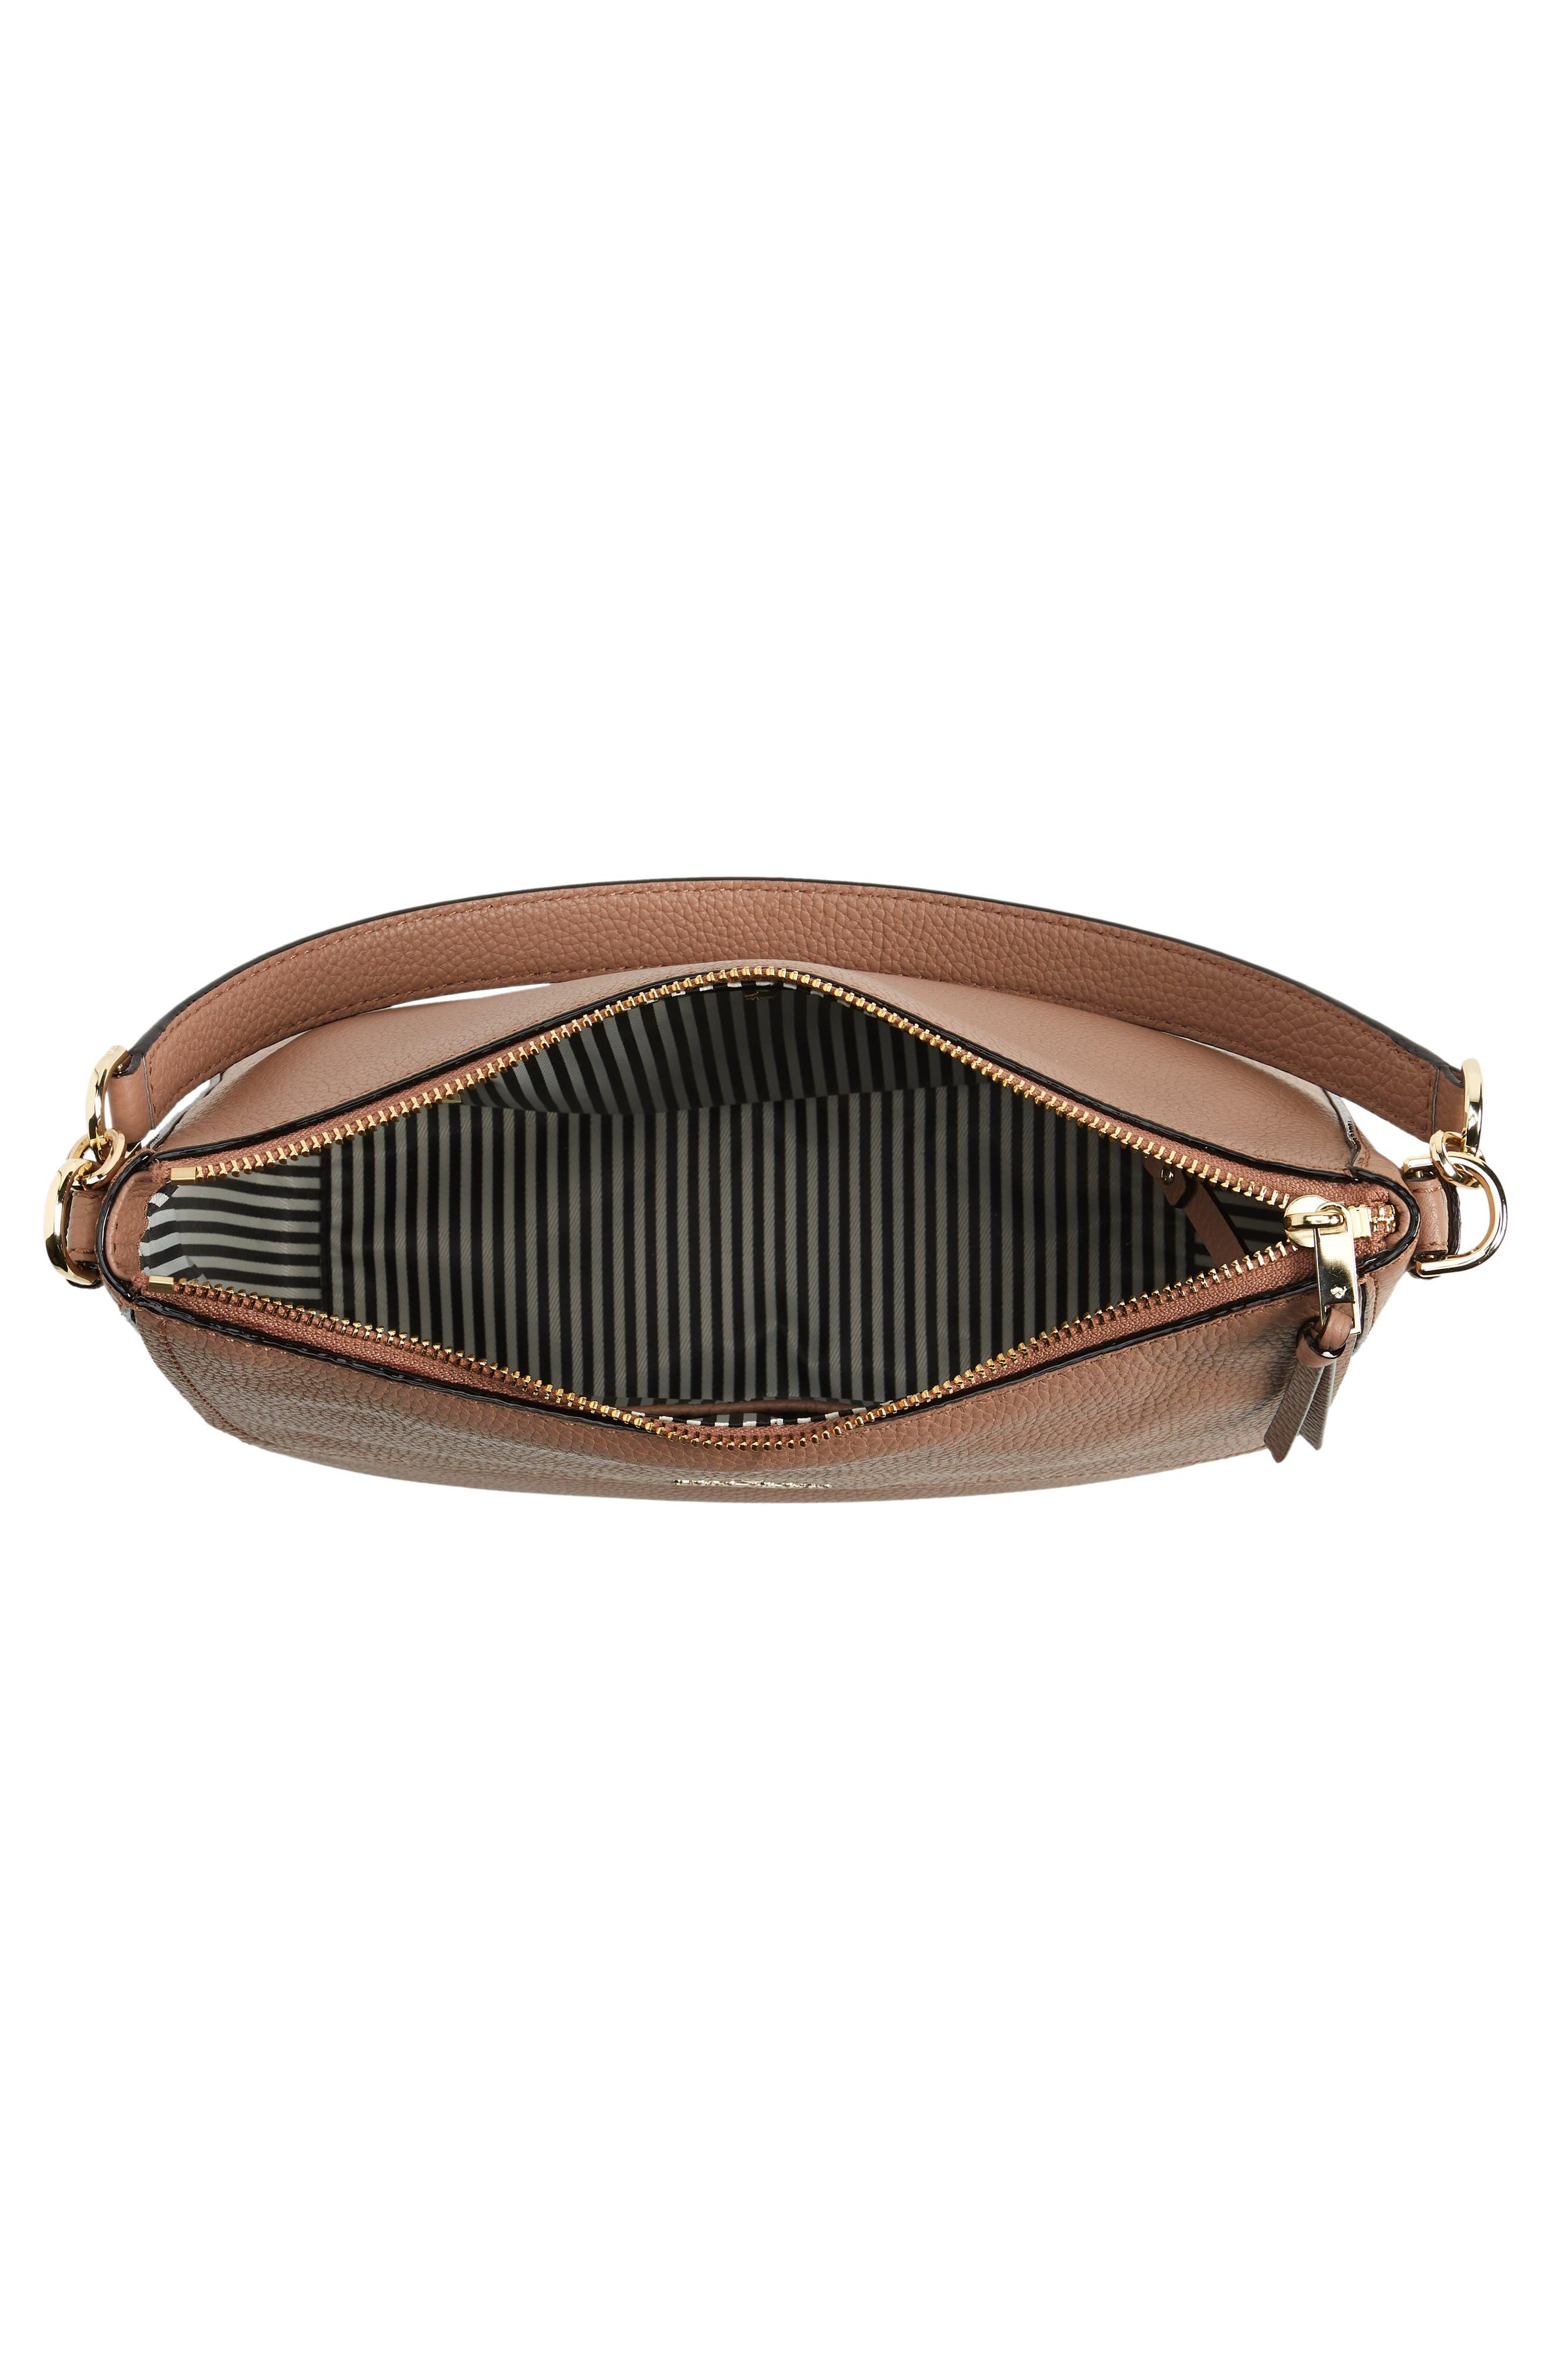 jackson street - colette leather satchel,                             Alternate thumbnail 4, color,                             Toasty